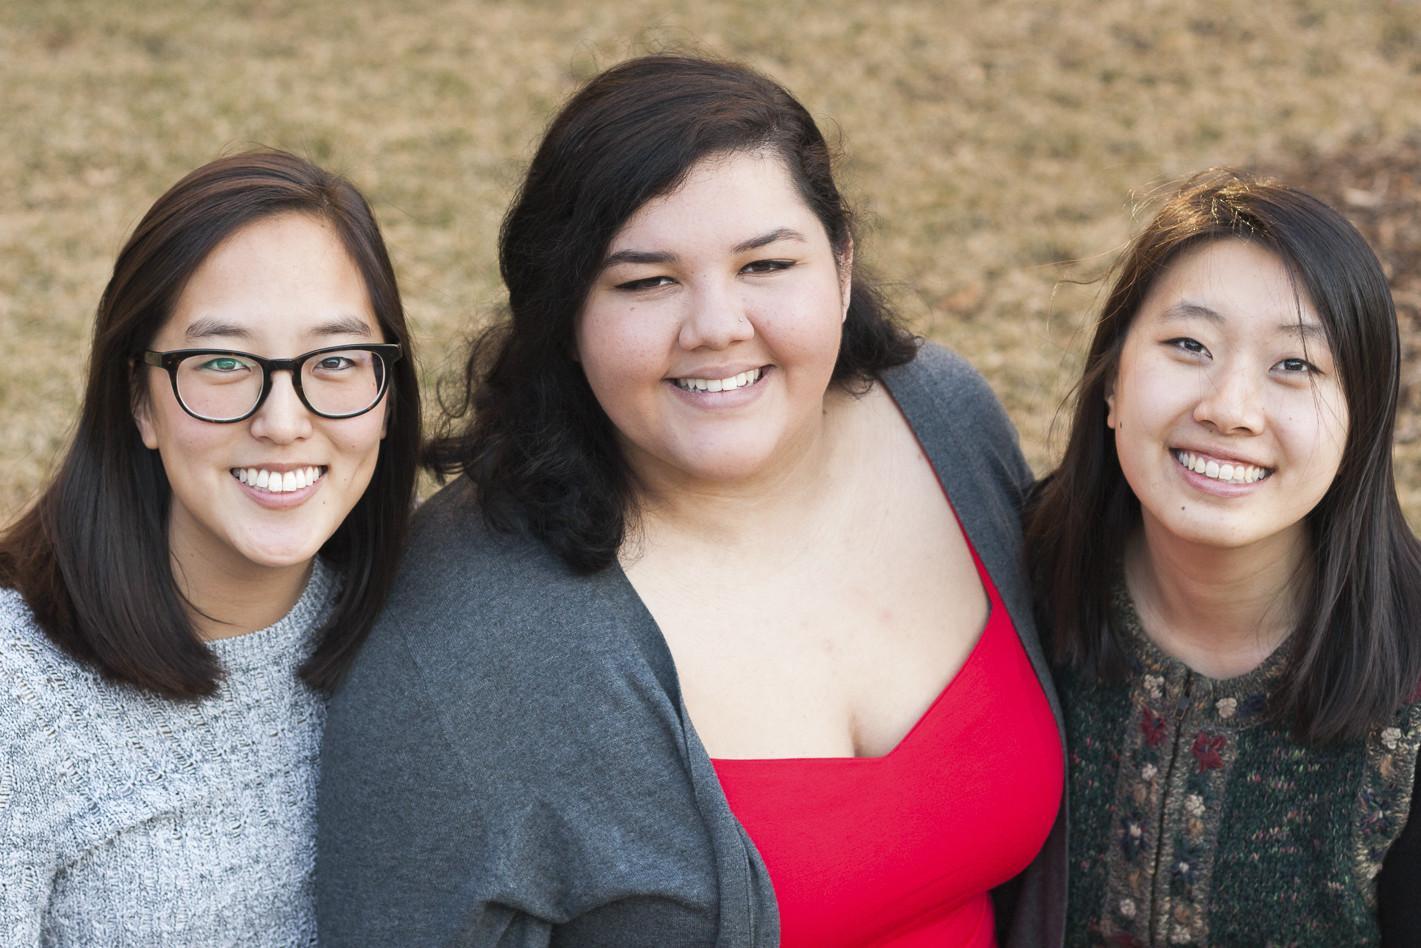 Senior Spotlight: Lillian Hexter, Selena Pruitt and Grace Newton